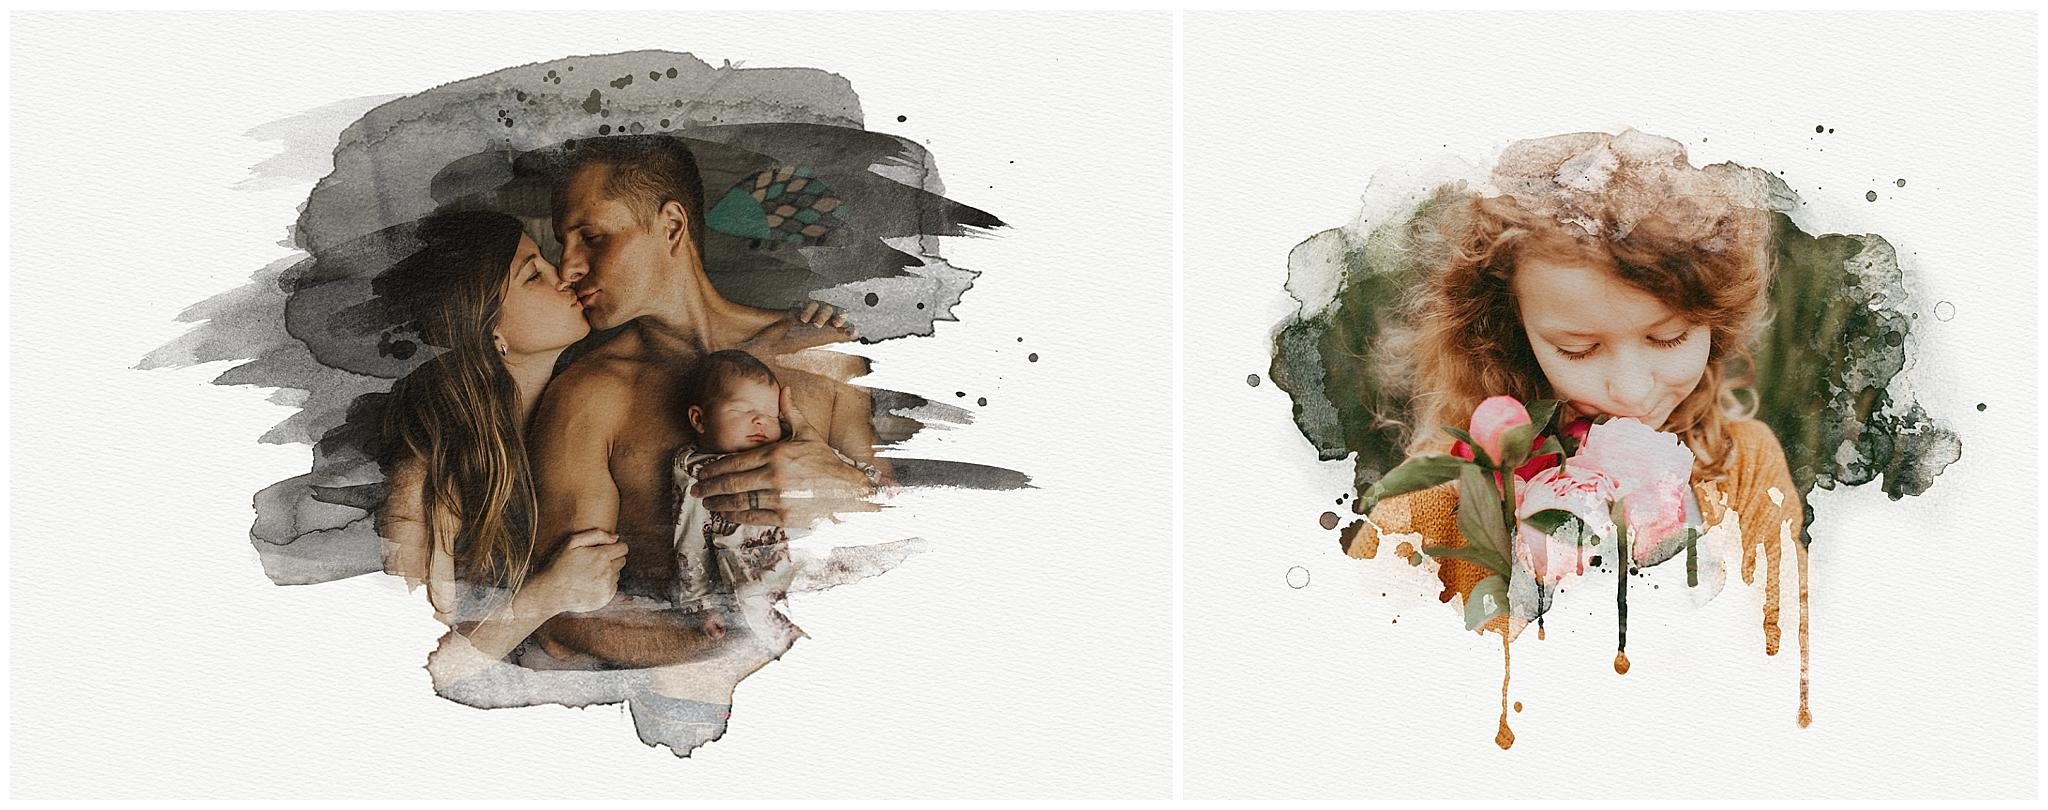 Creative watercolor photography artwork